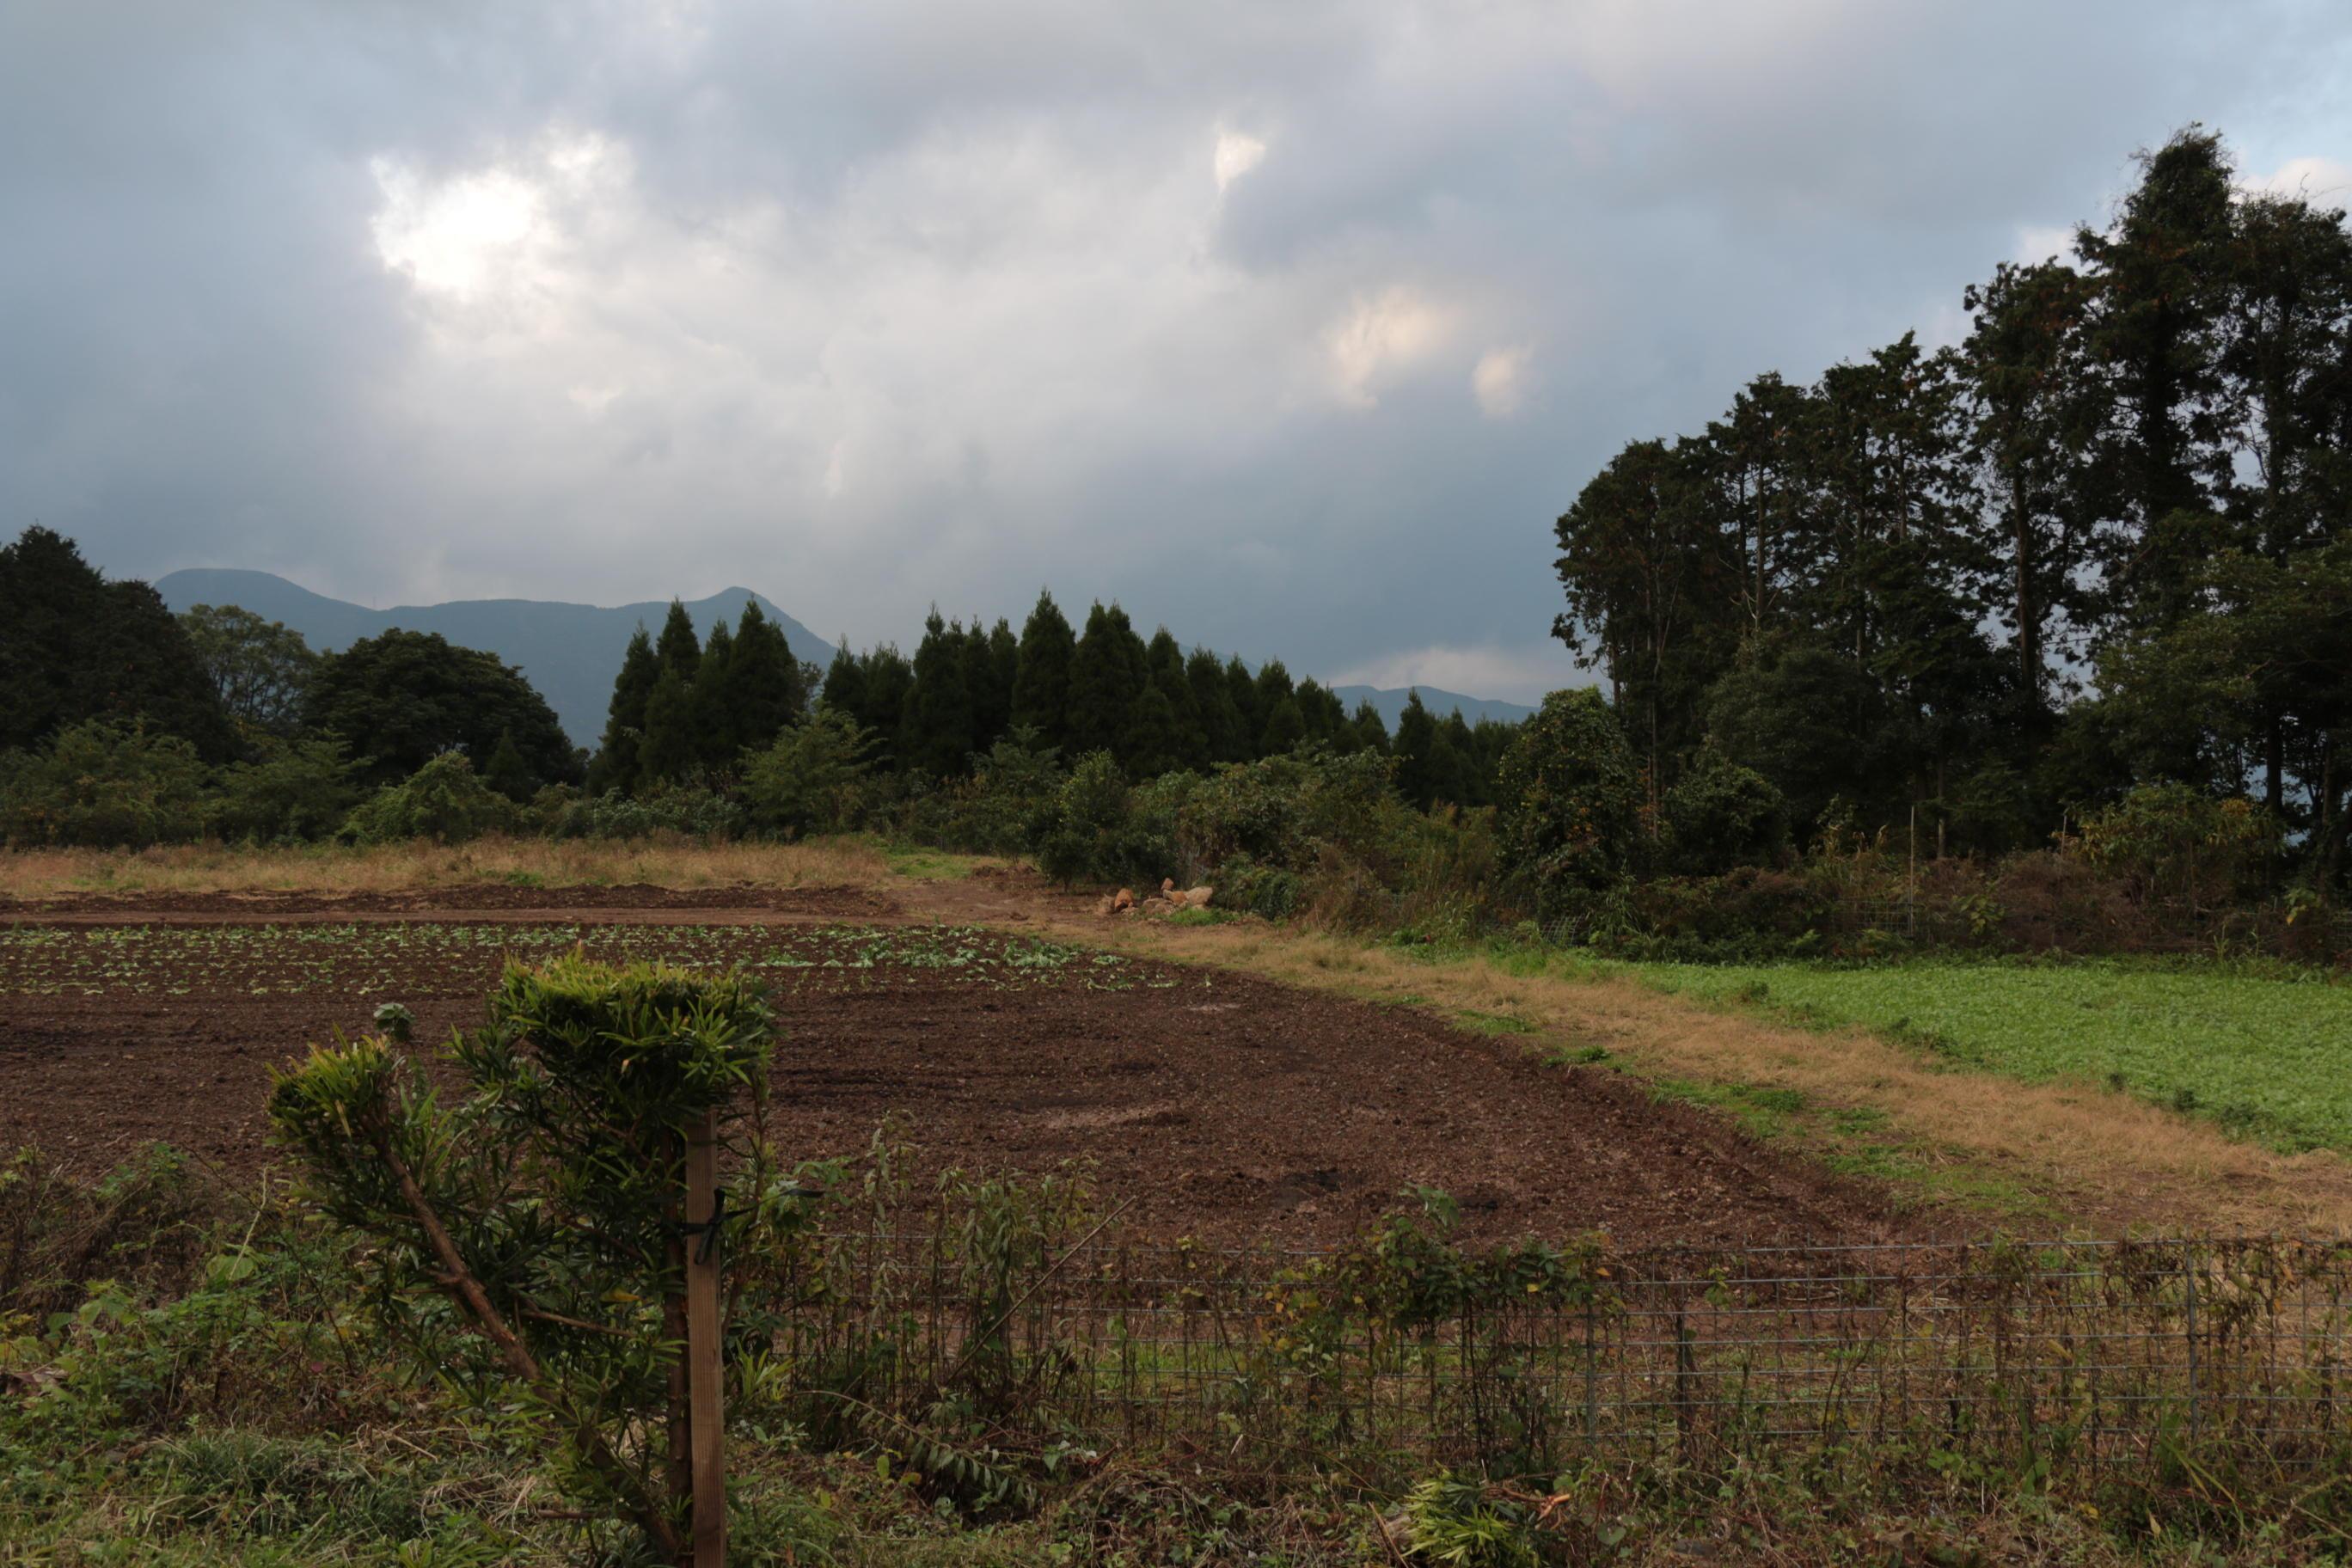 腰岳①_01_地点の風景_s